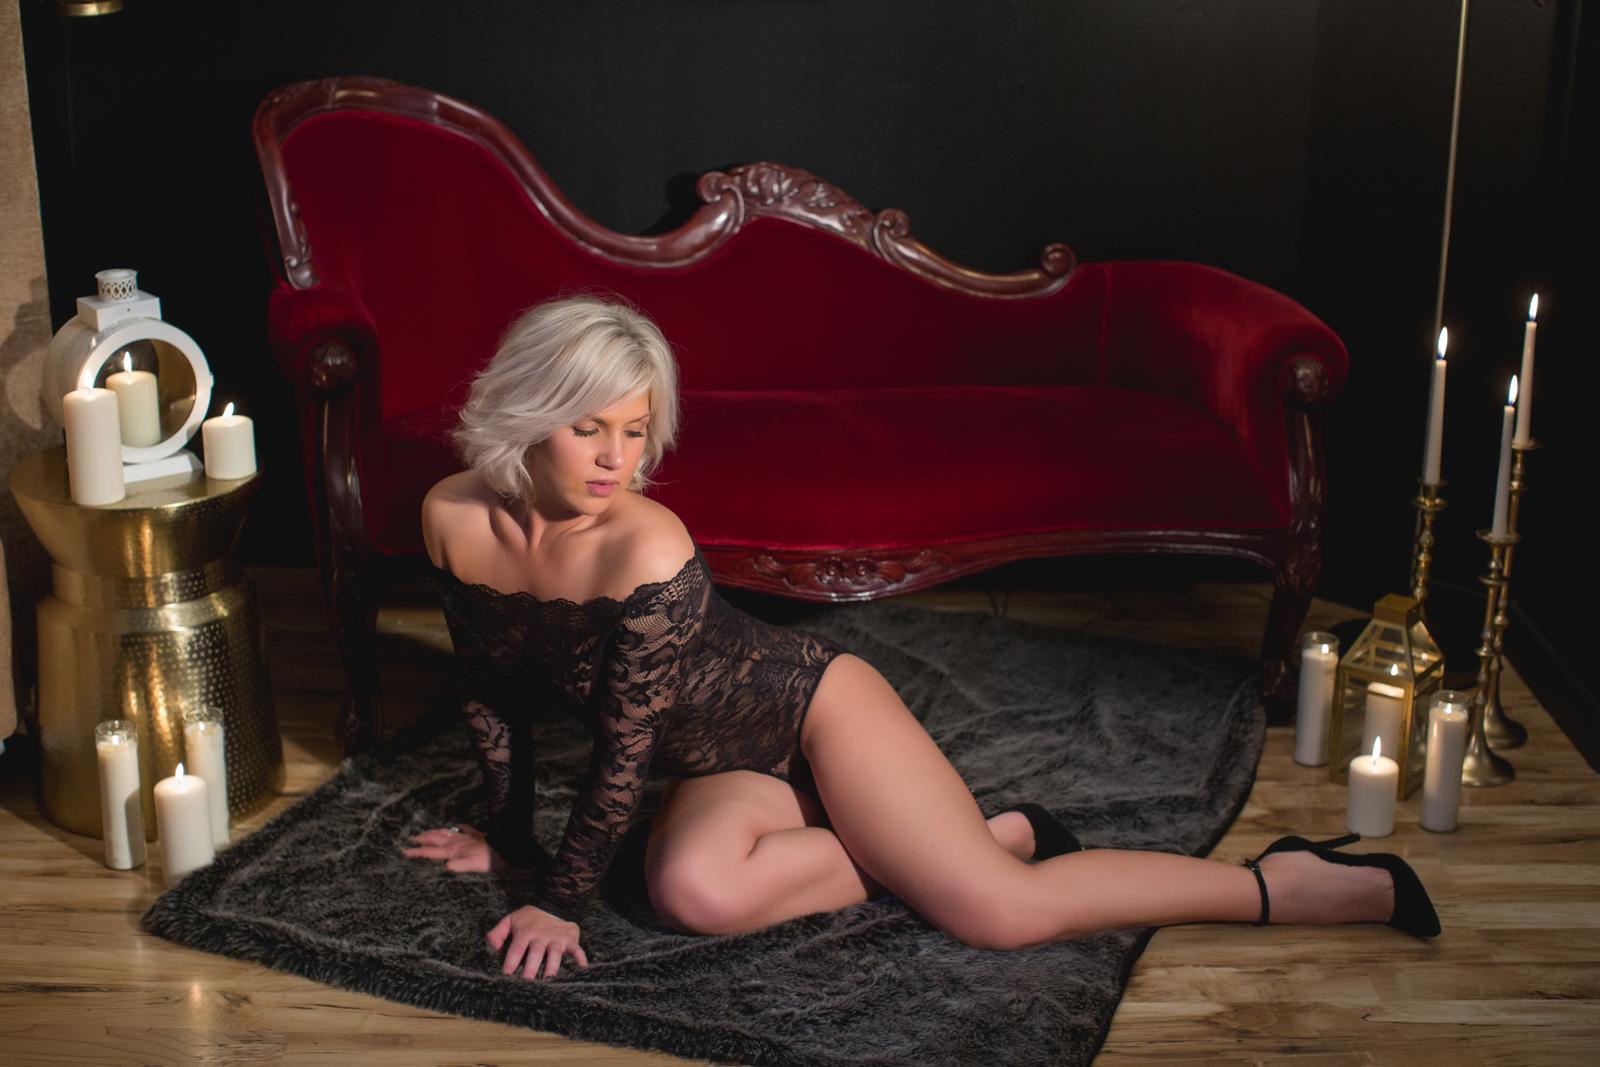 boudoir-photography-rochester-ny-03.jpg